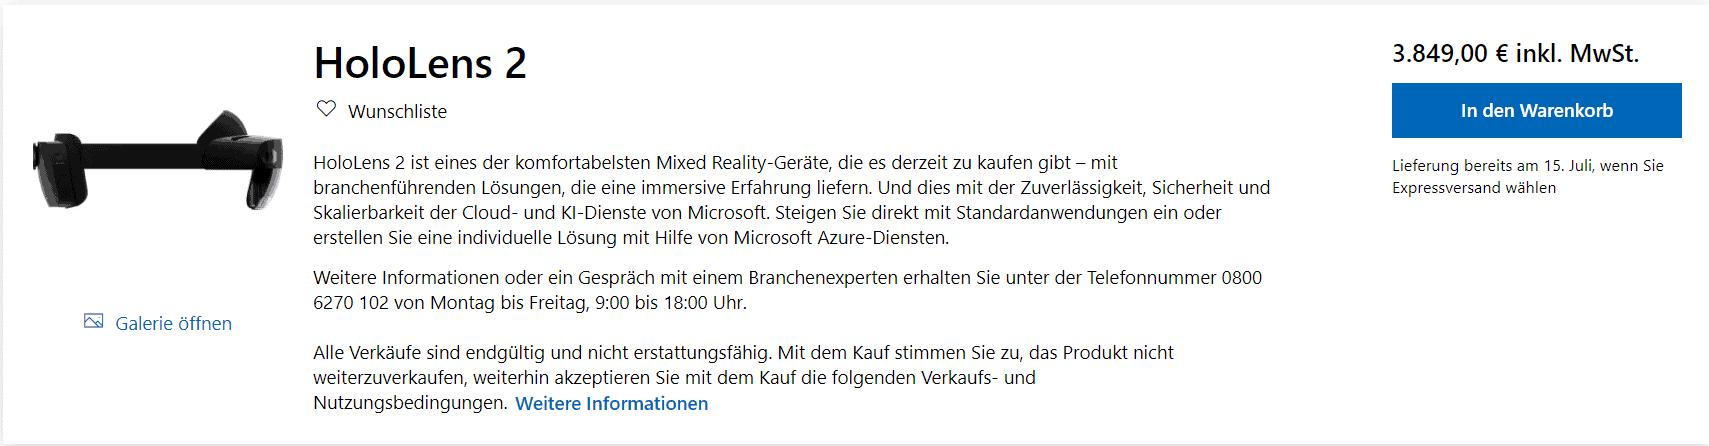 HoloLens 2 im Microsoft Store kaufen